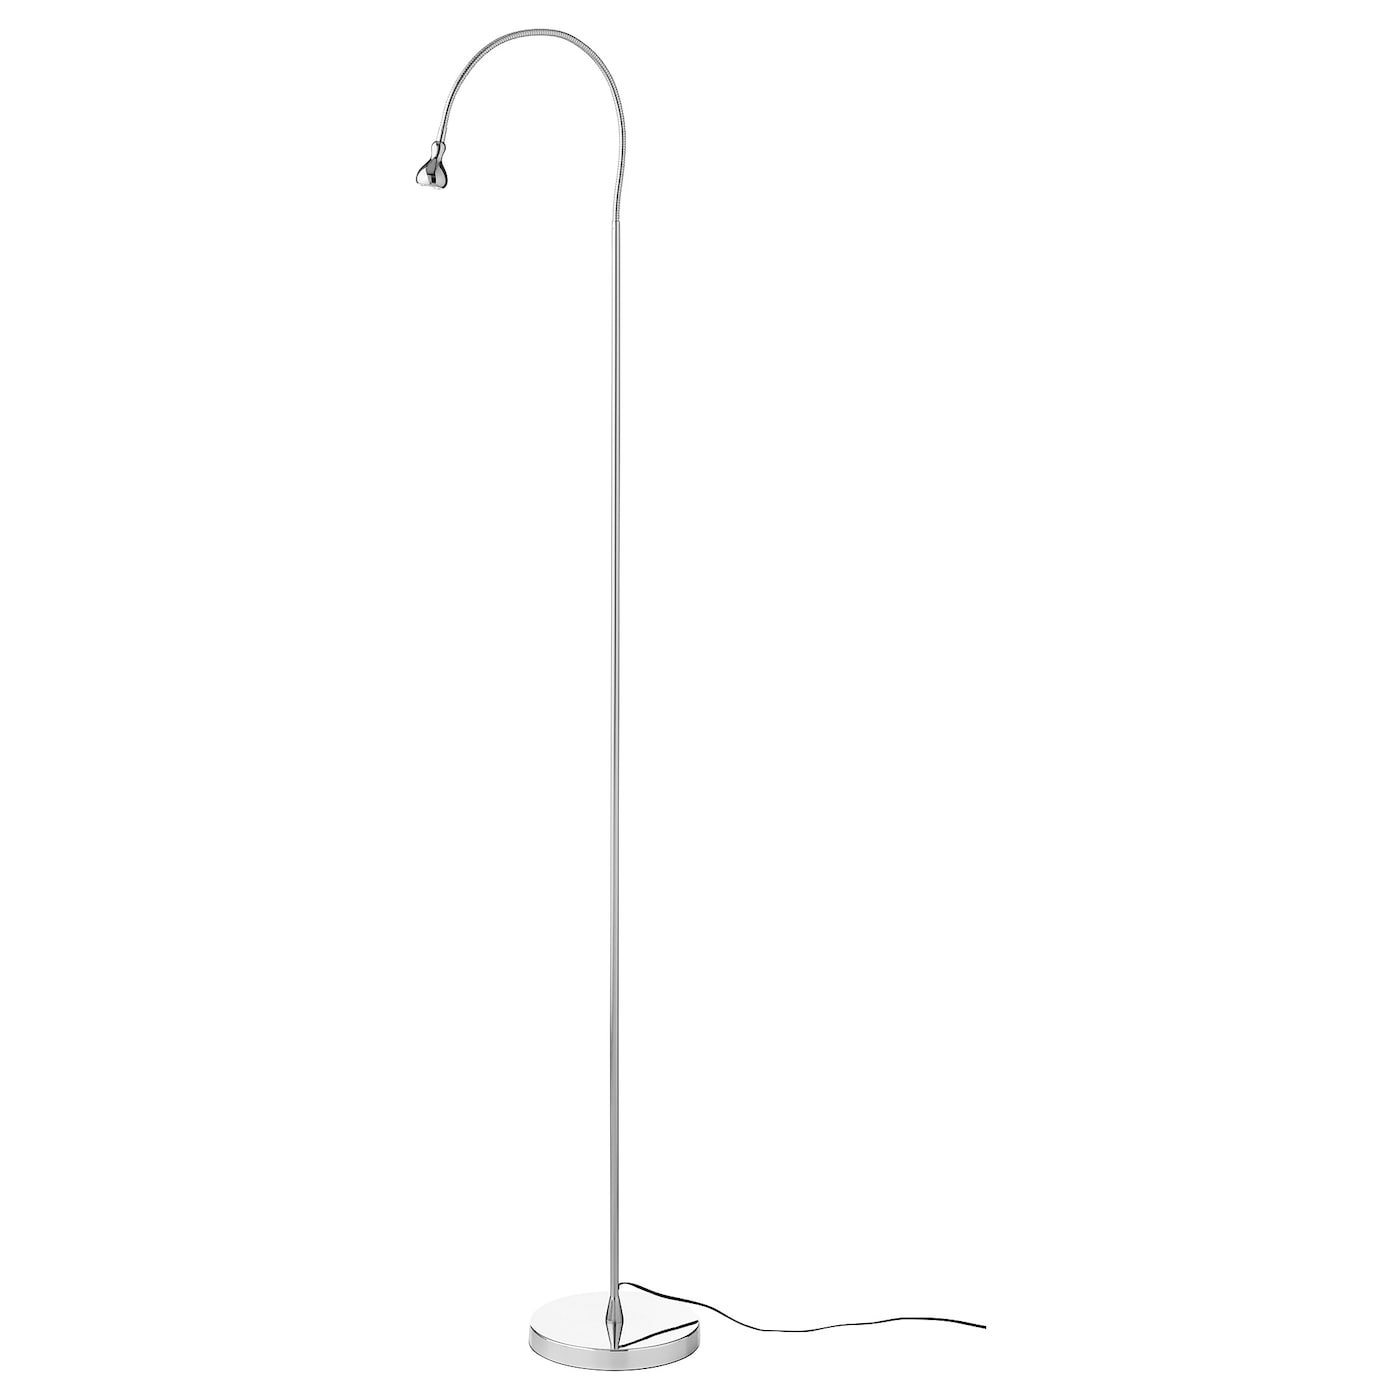 Jansjo Stand Leseleuchte Led Silberfarben Ikea Deutschland